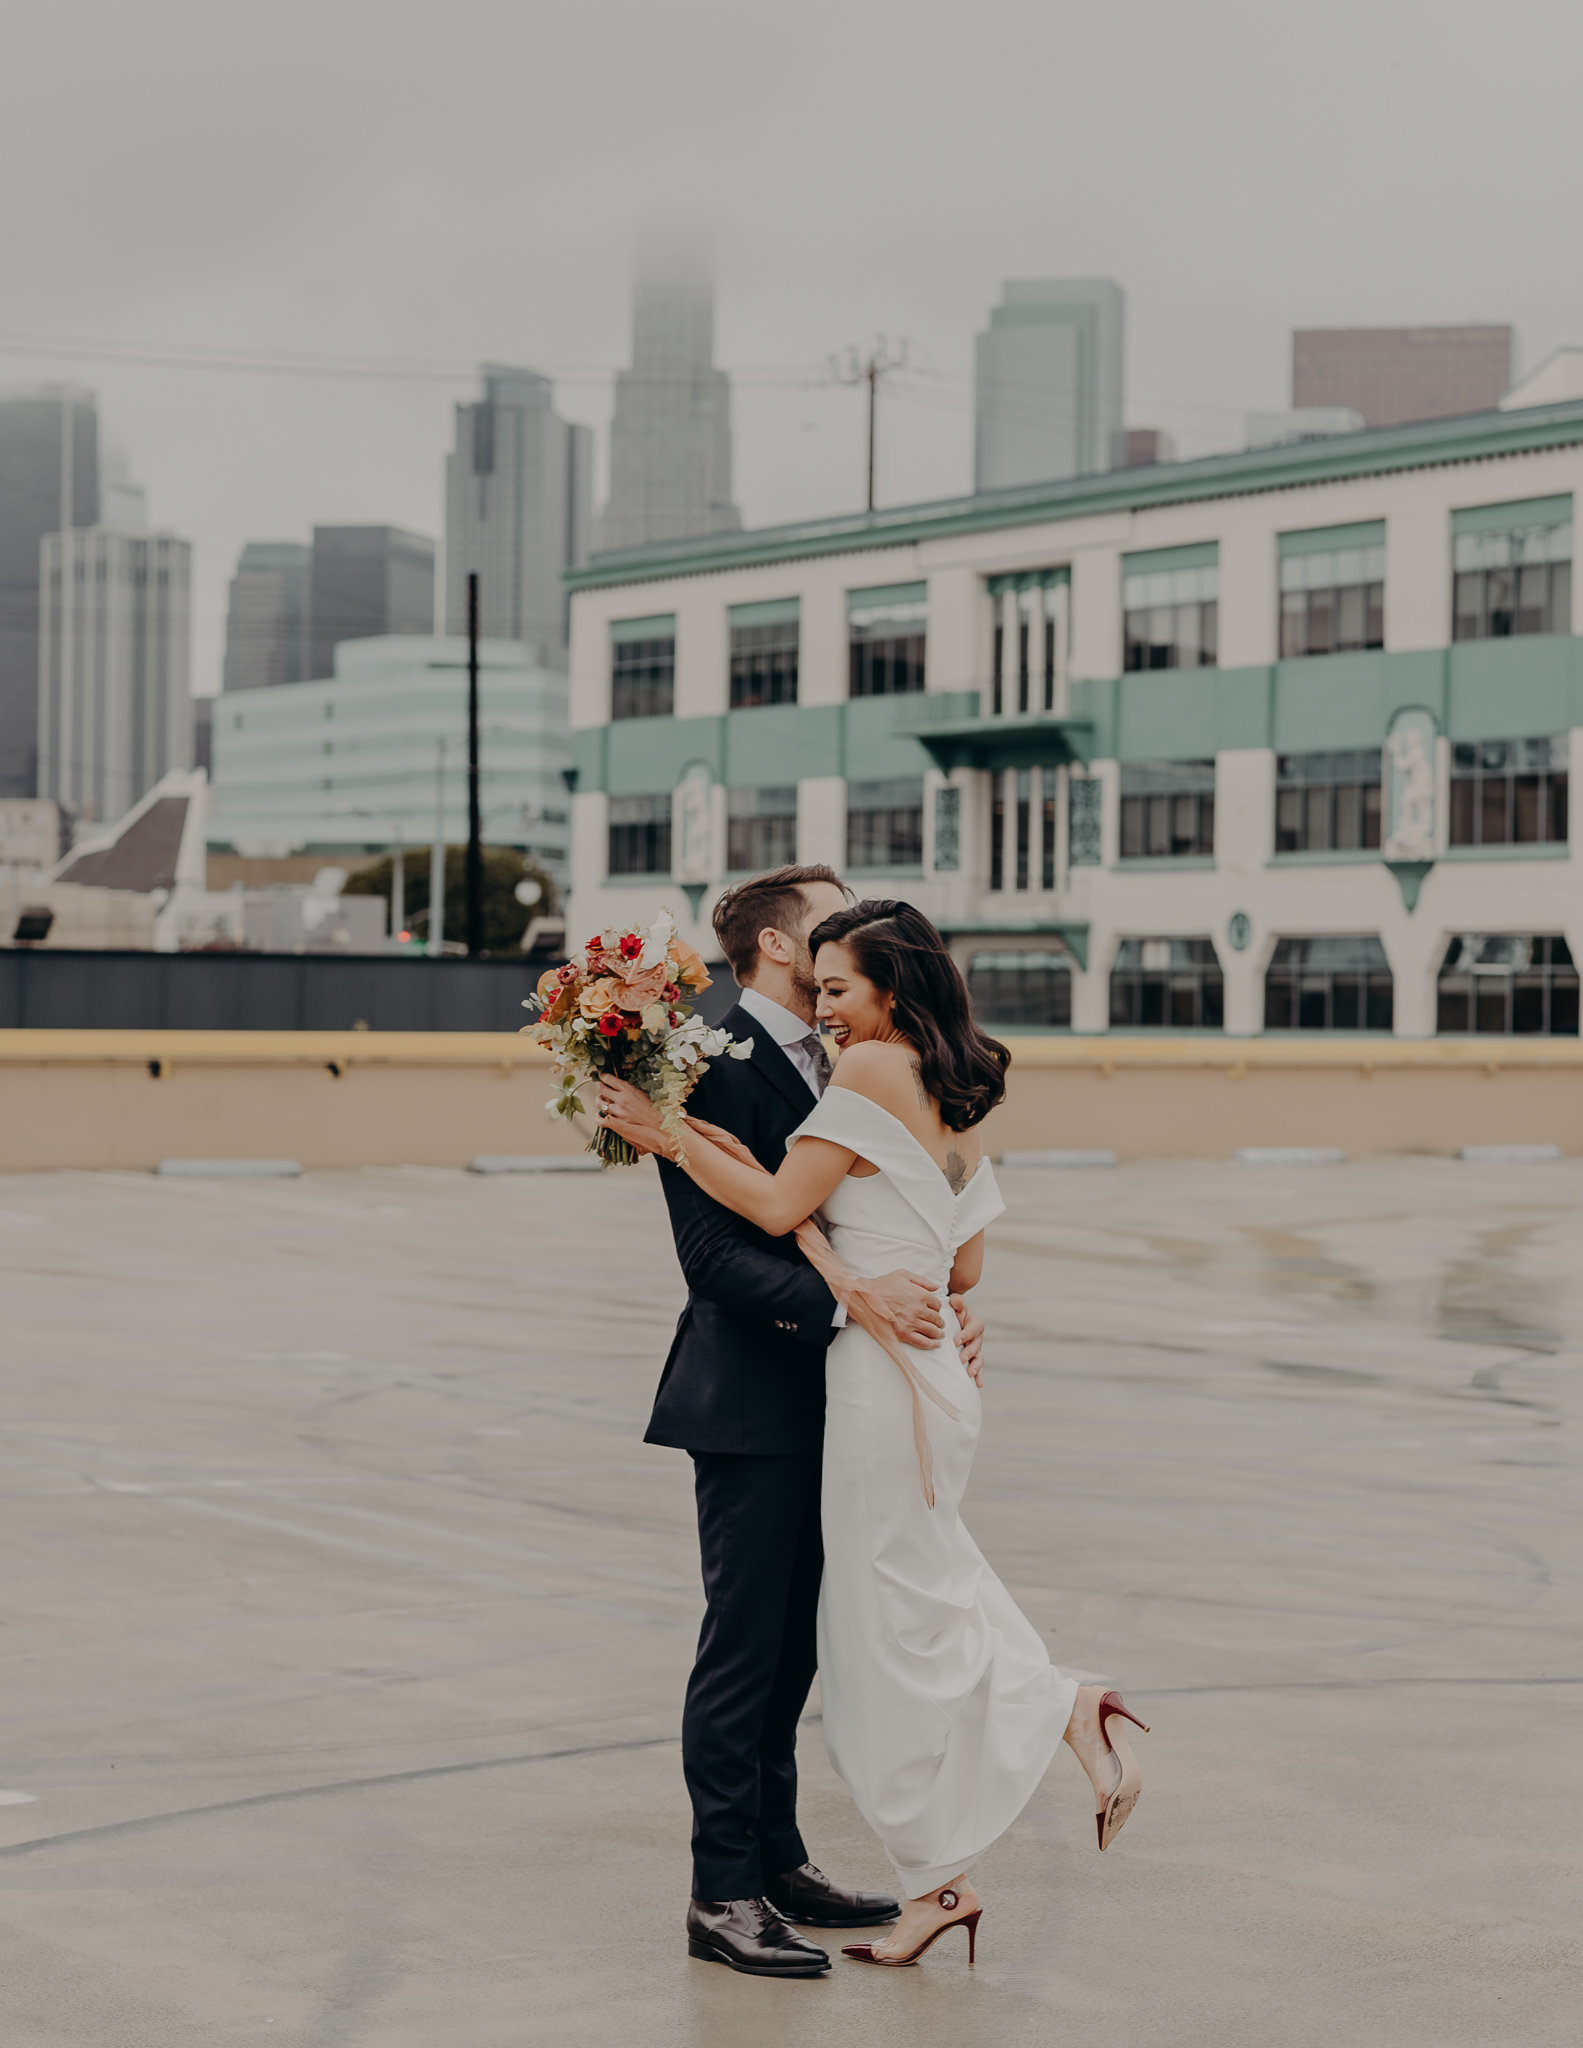 Wedding Photo LA - wedding photographer in los angeles - millwick wedding venue -isaiahandtaylor.com-072.jpg